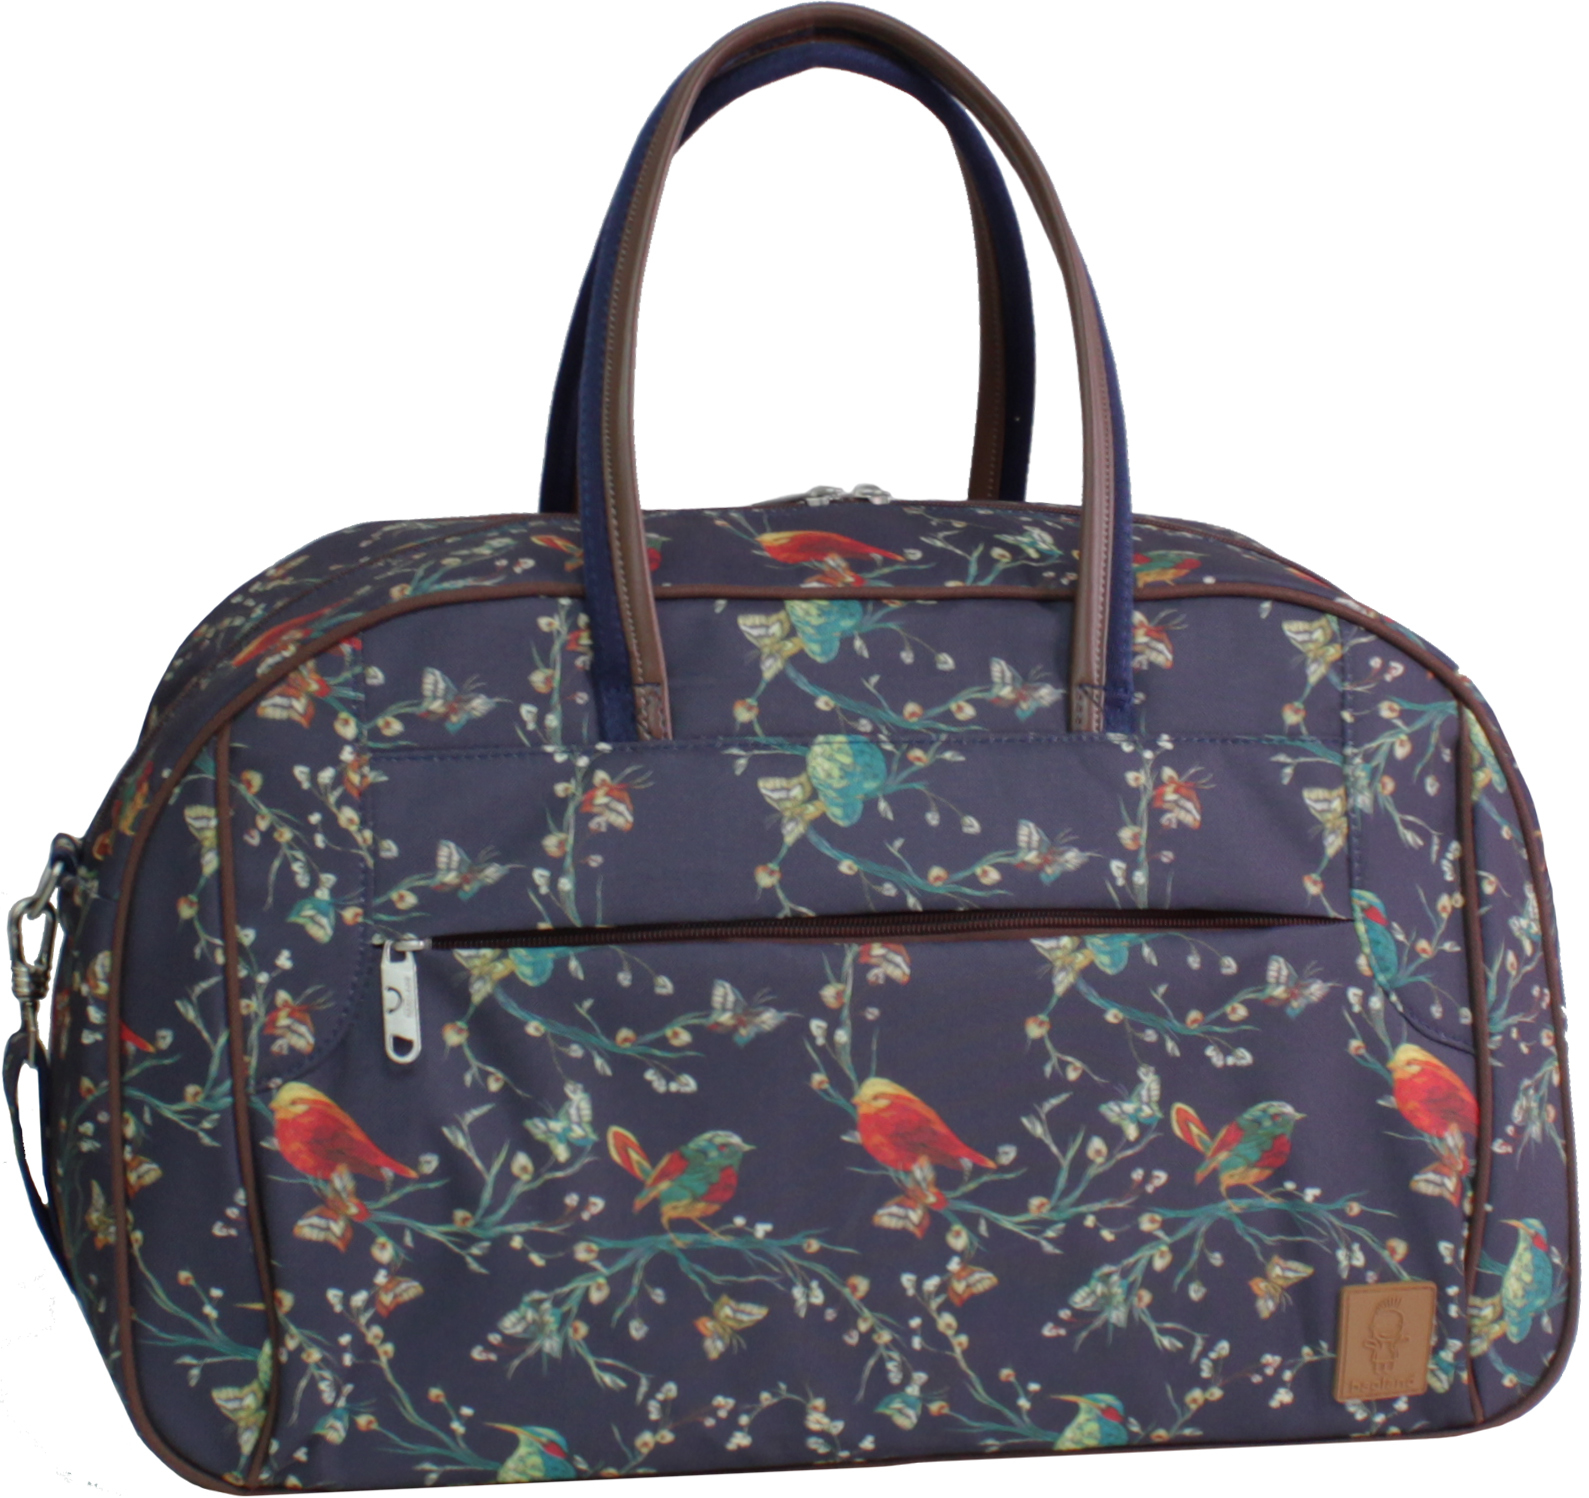 Спортивные сумки Сумка Bagland Тунис 34 л. Сублимация 160 (00390664) IMG_9095.JPG